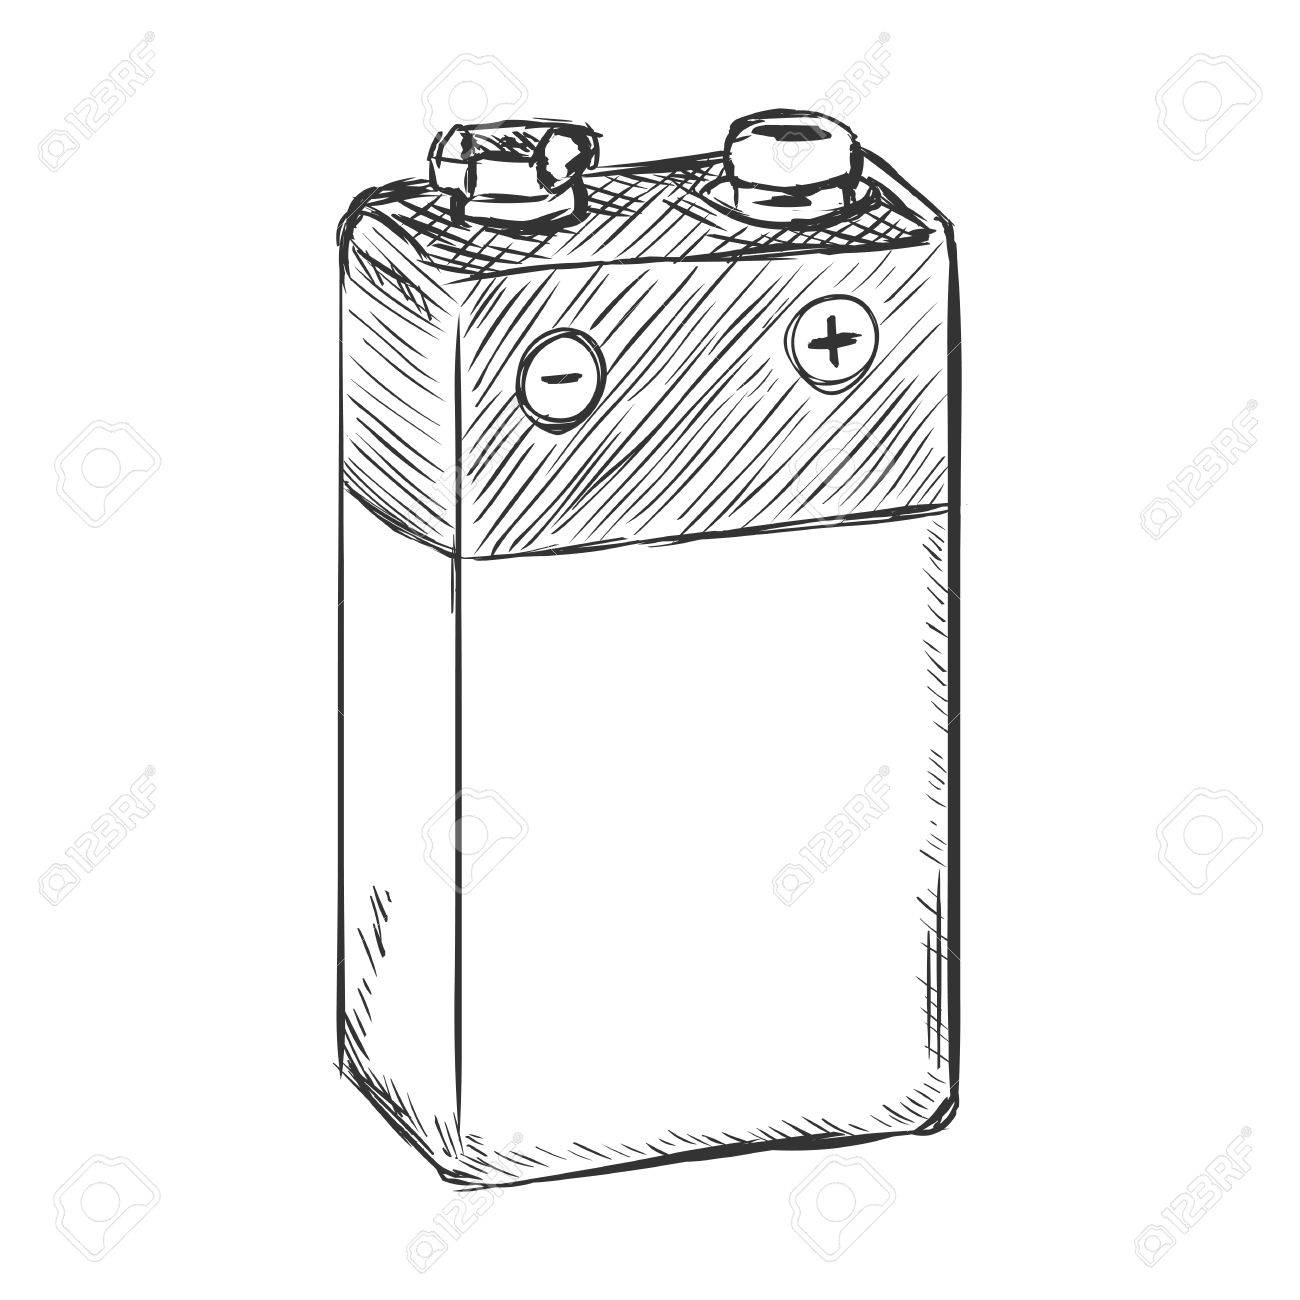 Battery sketch